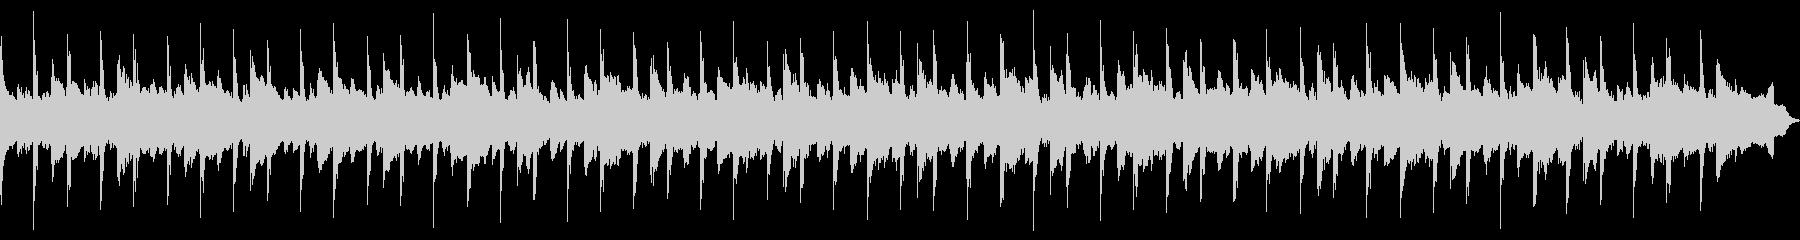 CM用BGM(ピアノアルペジオ+シンセ)の未再生の波形